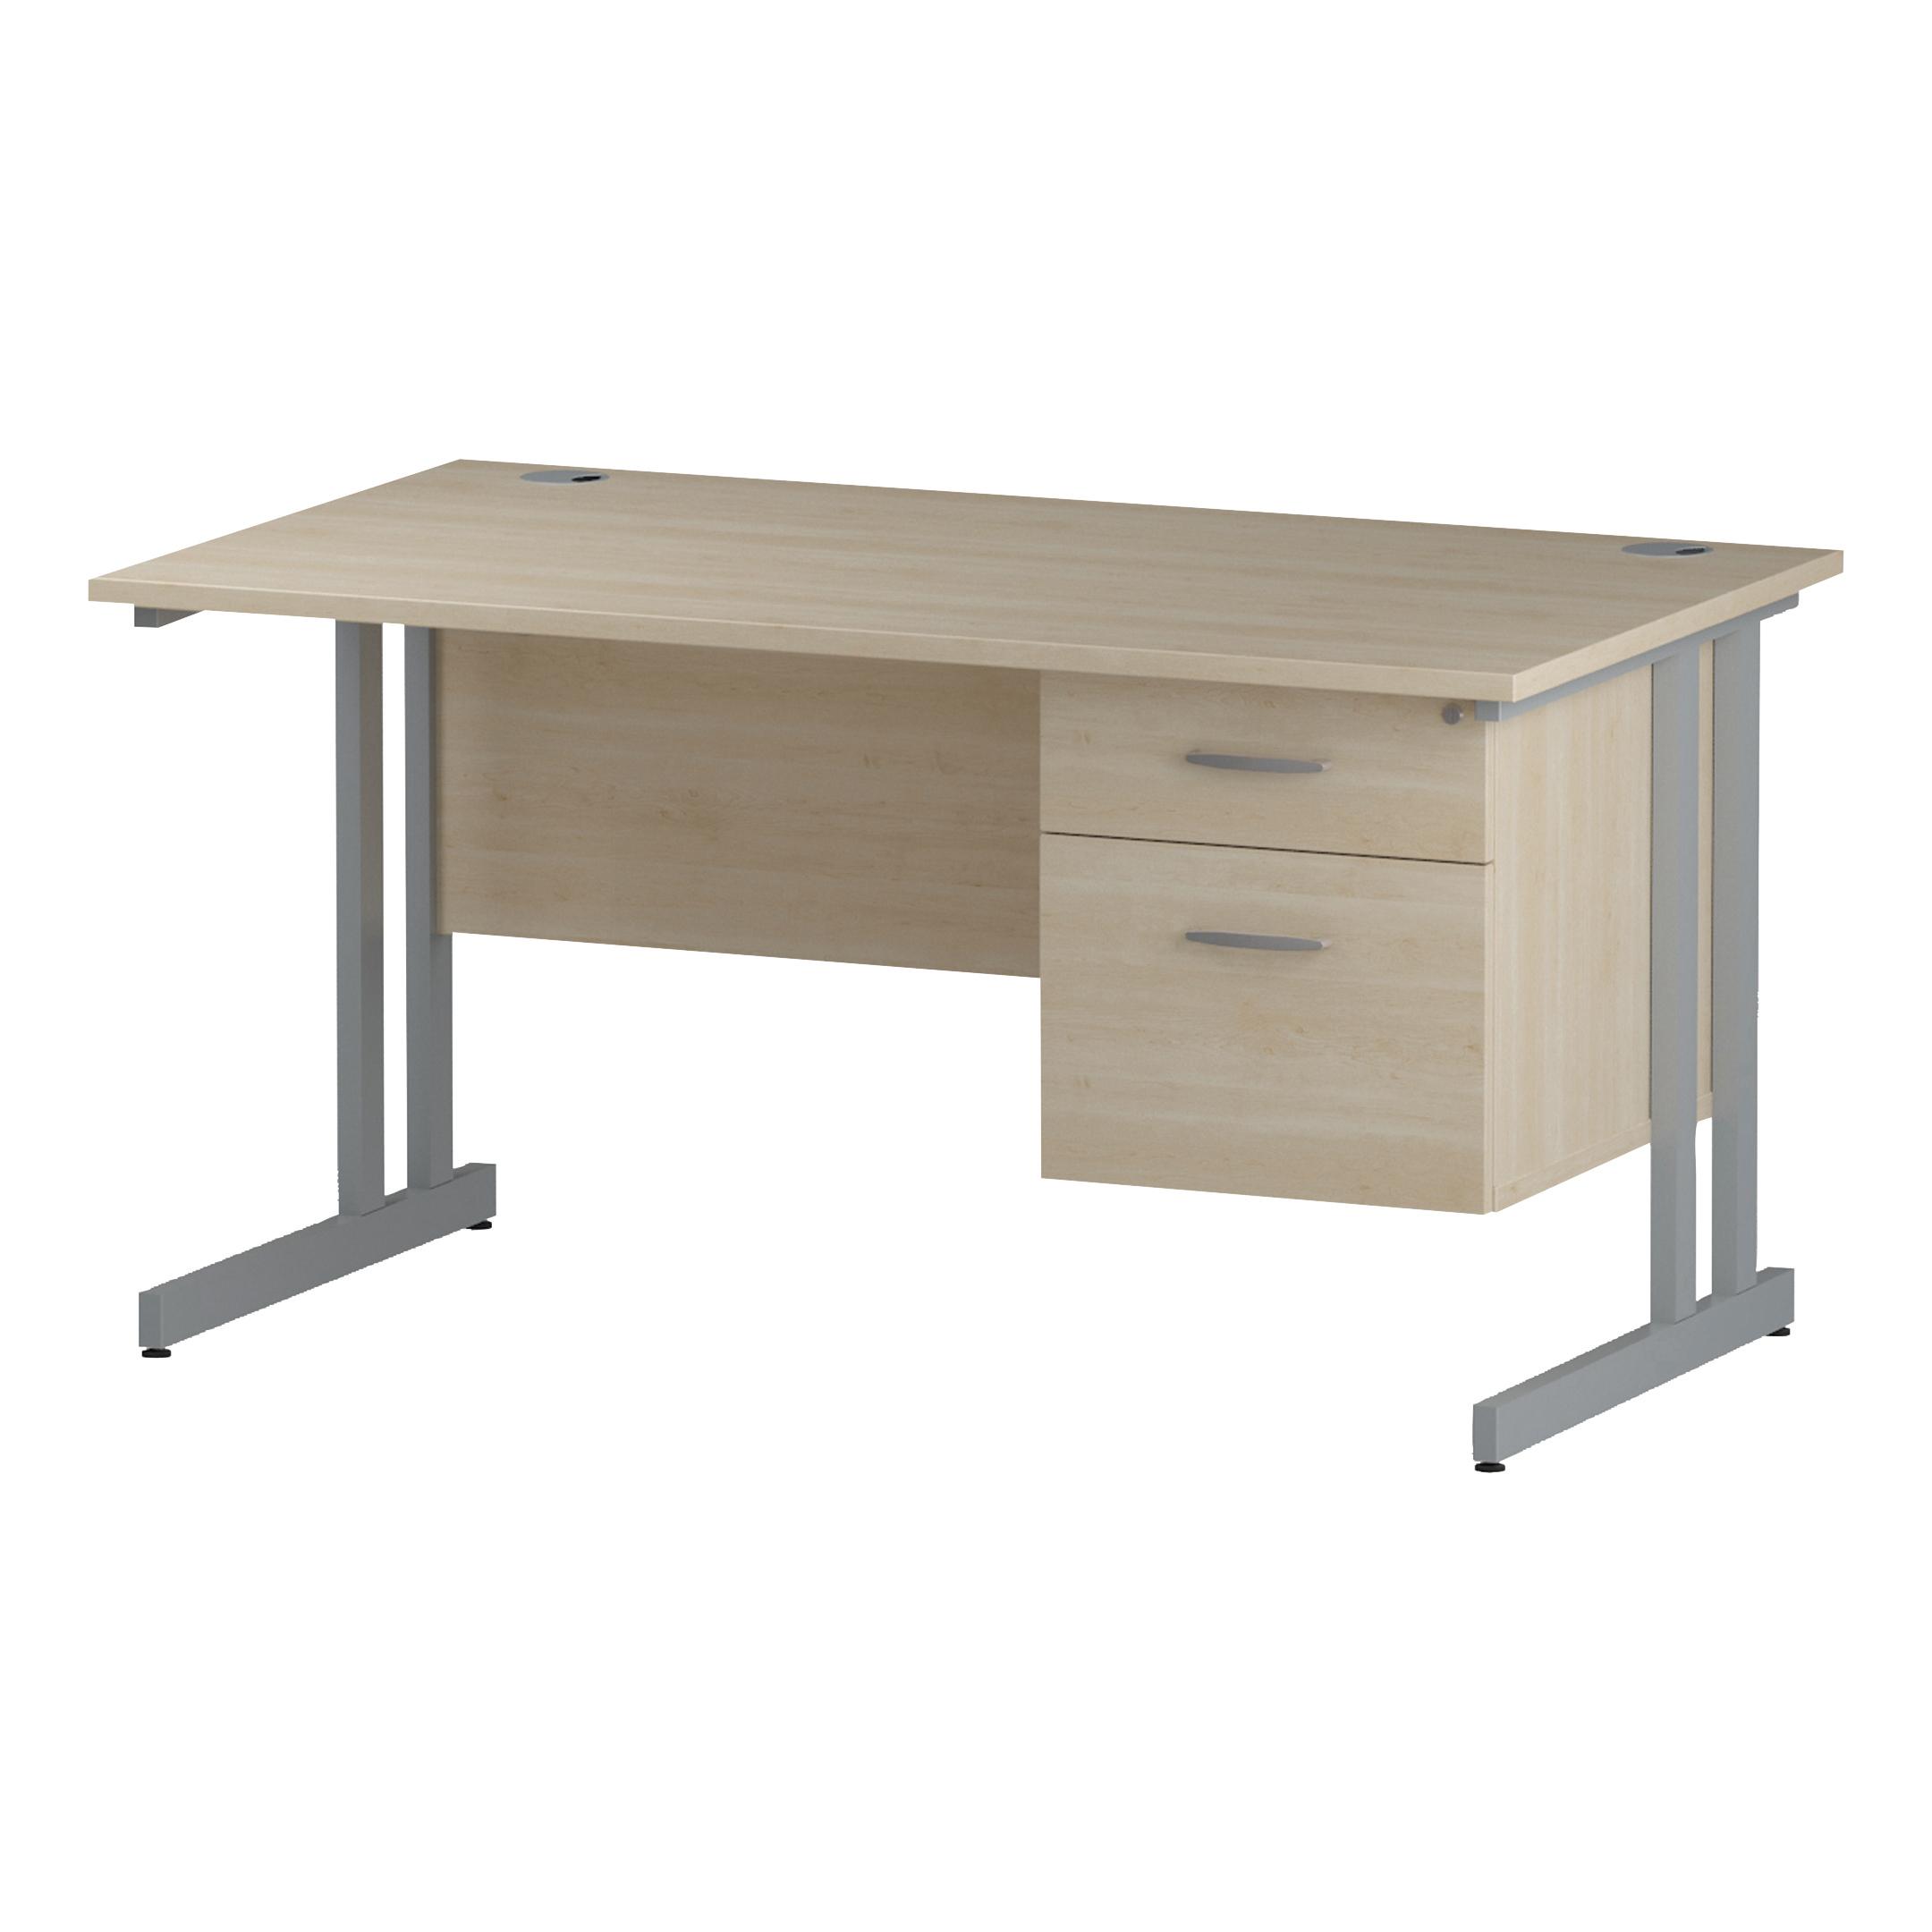 Trexus Rectangular Desk Silver Cantilever Leg 1400x800mm Fixed Pedestal 2 Drawers Maple Ref I002432